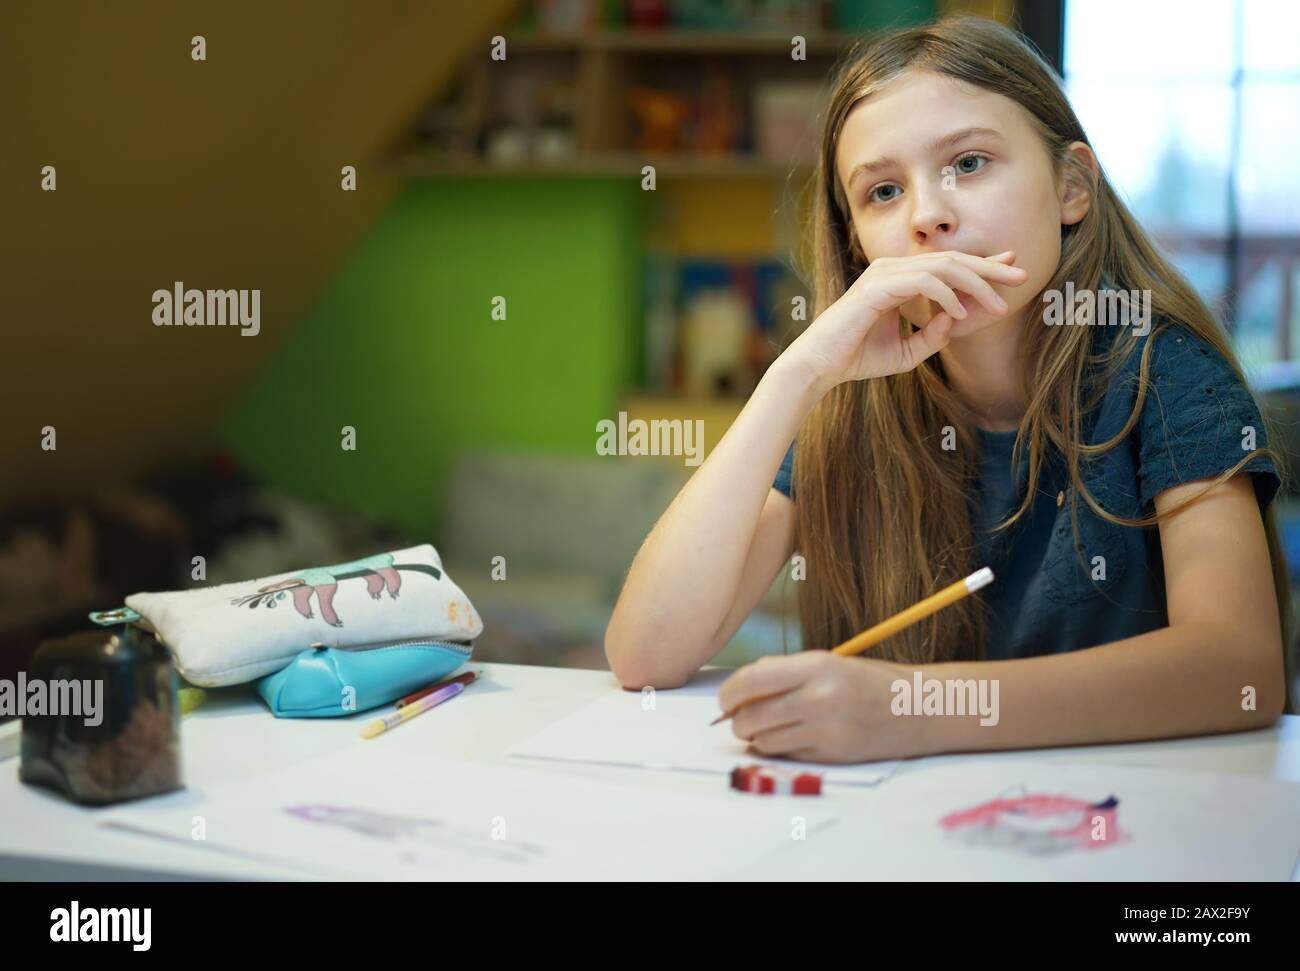 la niña se centró en dibujar en casa Foto de stock